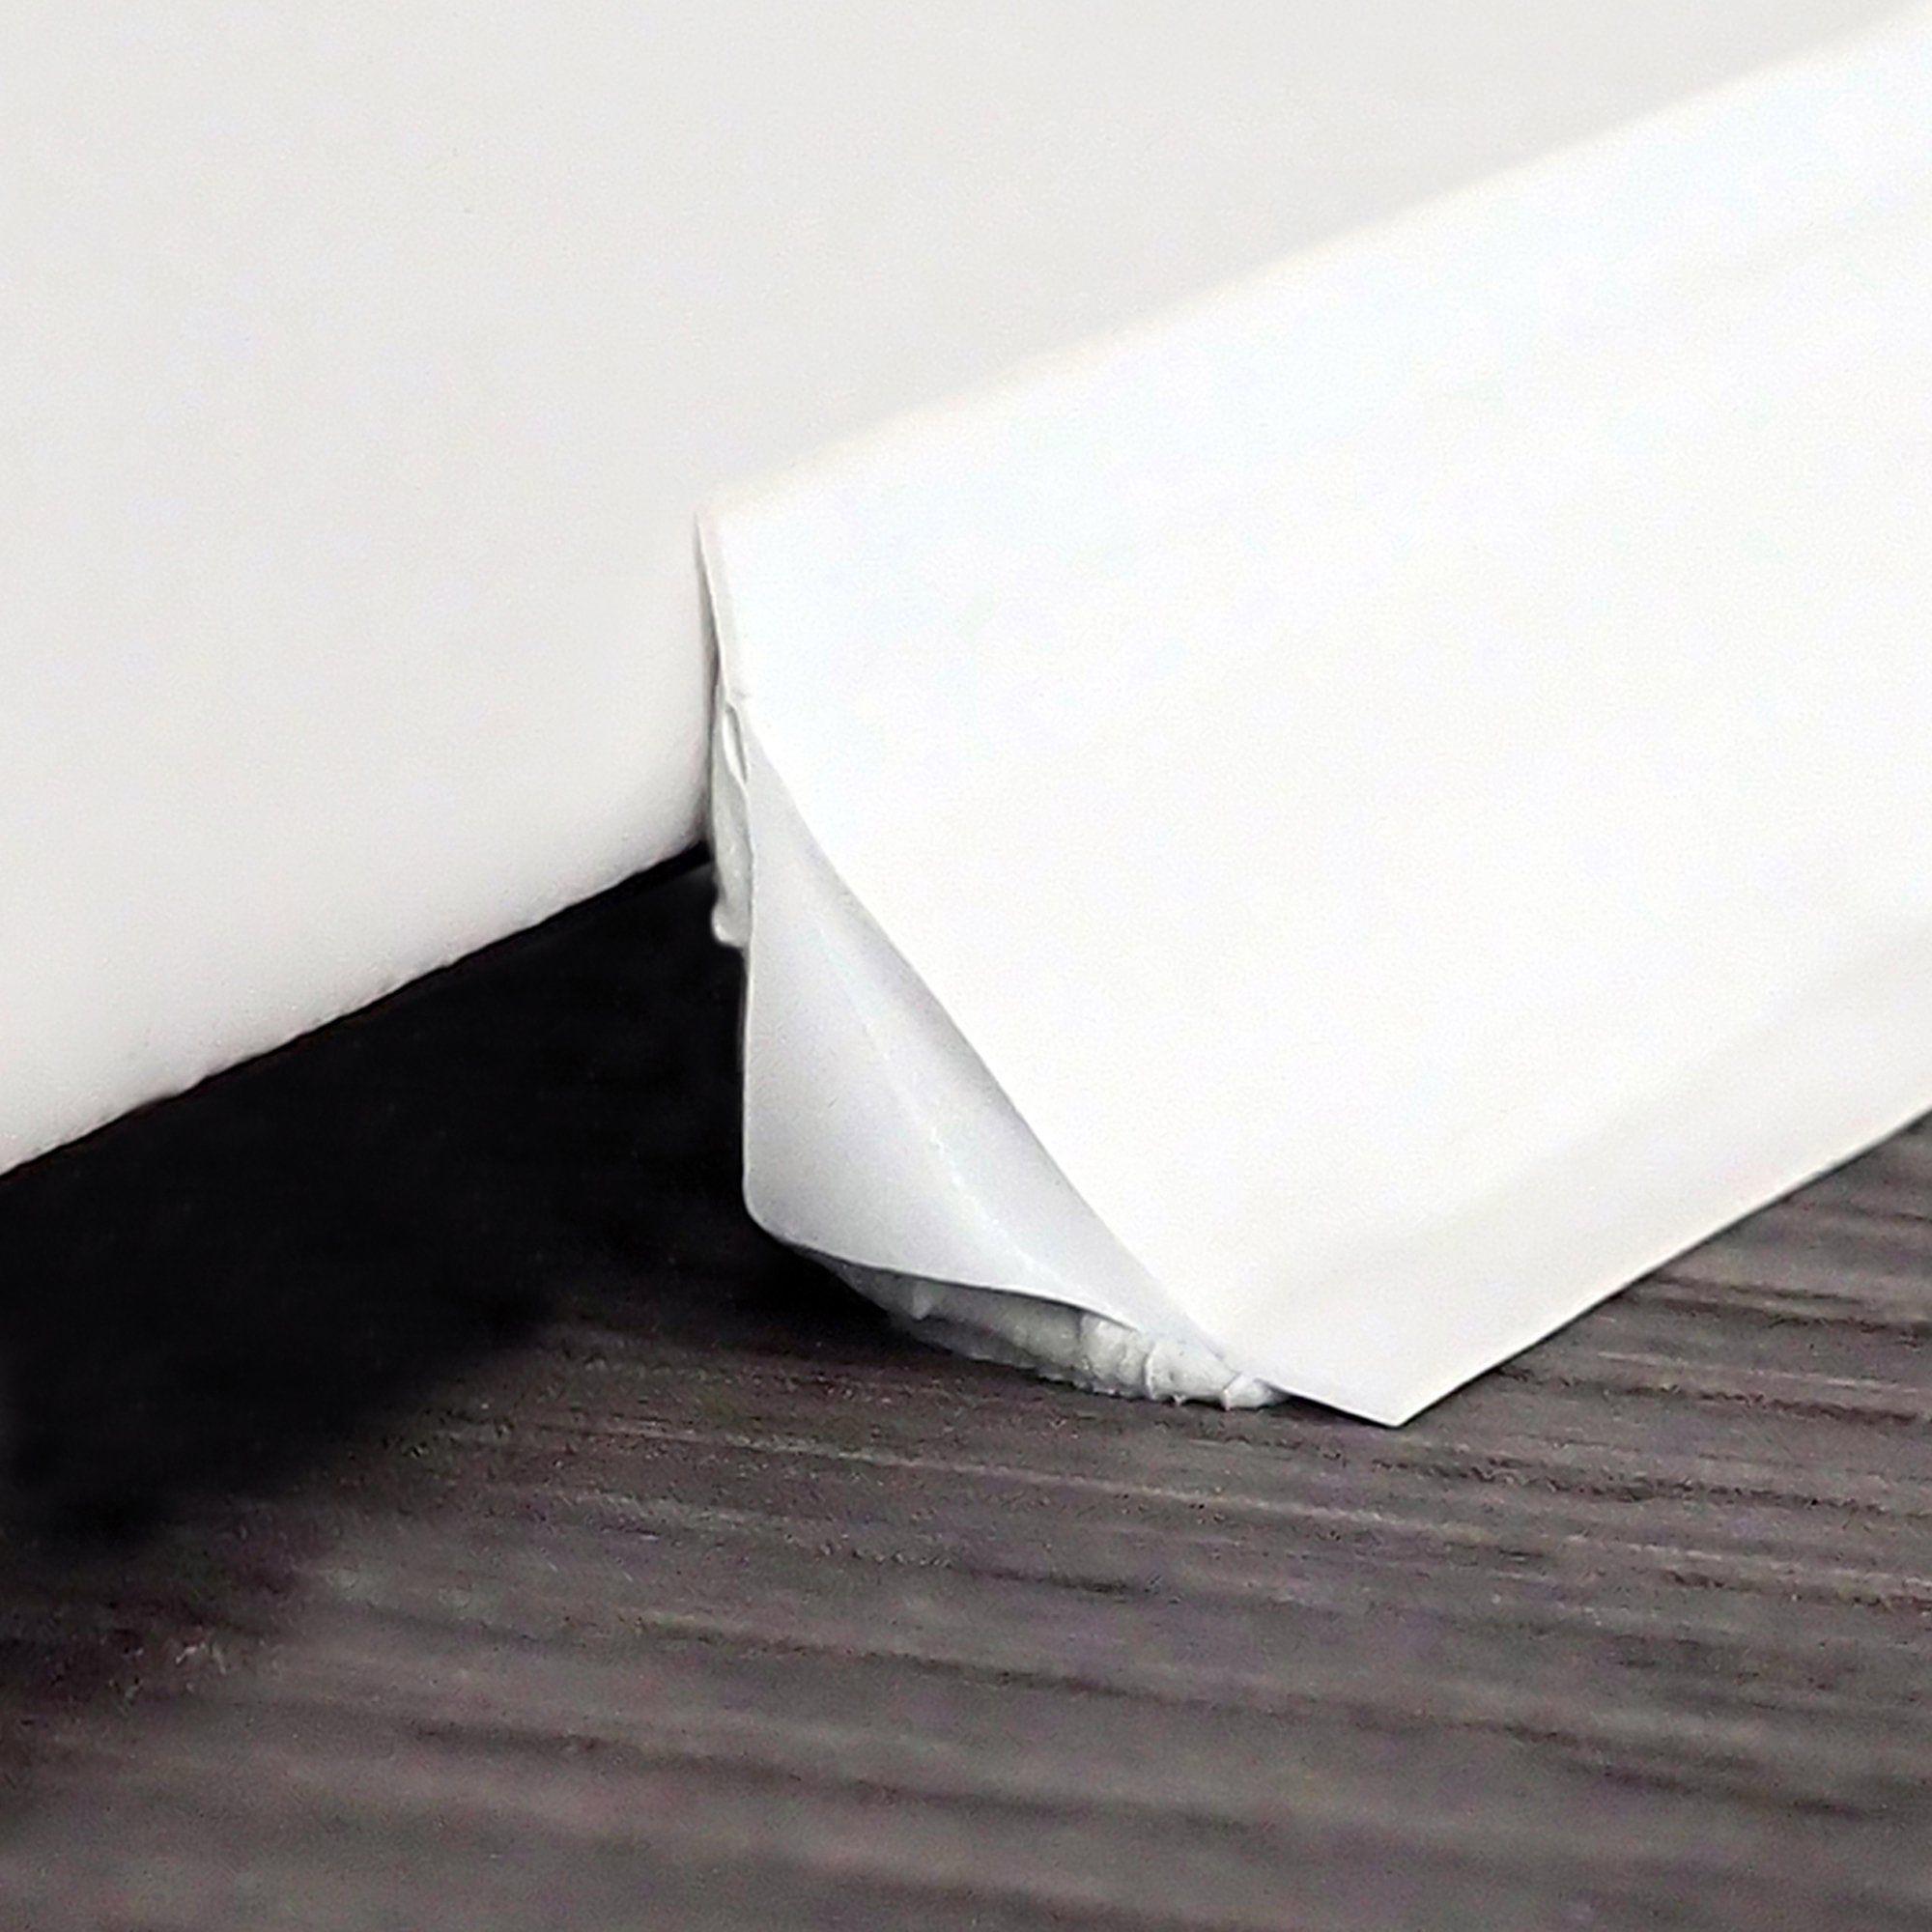 Instatrim 3 4 Flexible Trim Moulding Caulk Strips White 50 Ft 1 Pack Walmart Com In 2020 Moldings And Trim Baseboards Caulk Strips